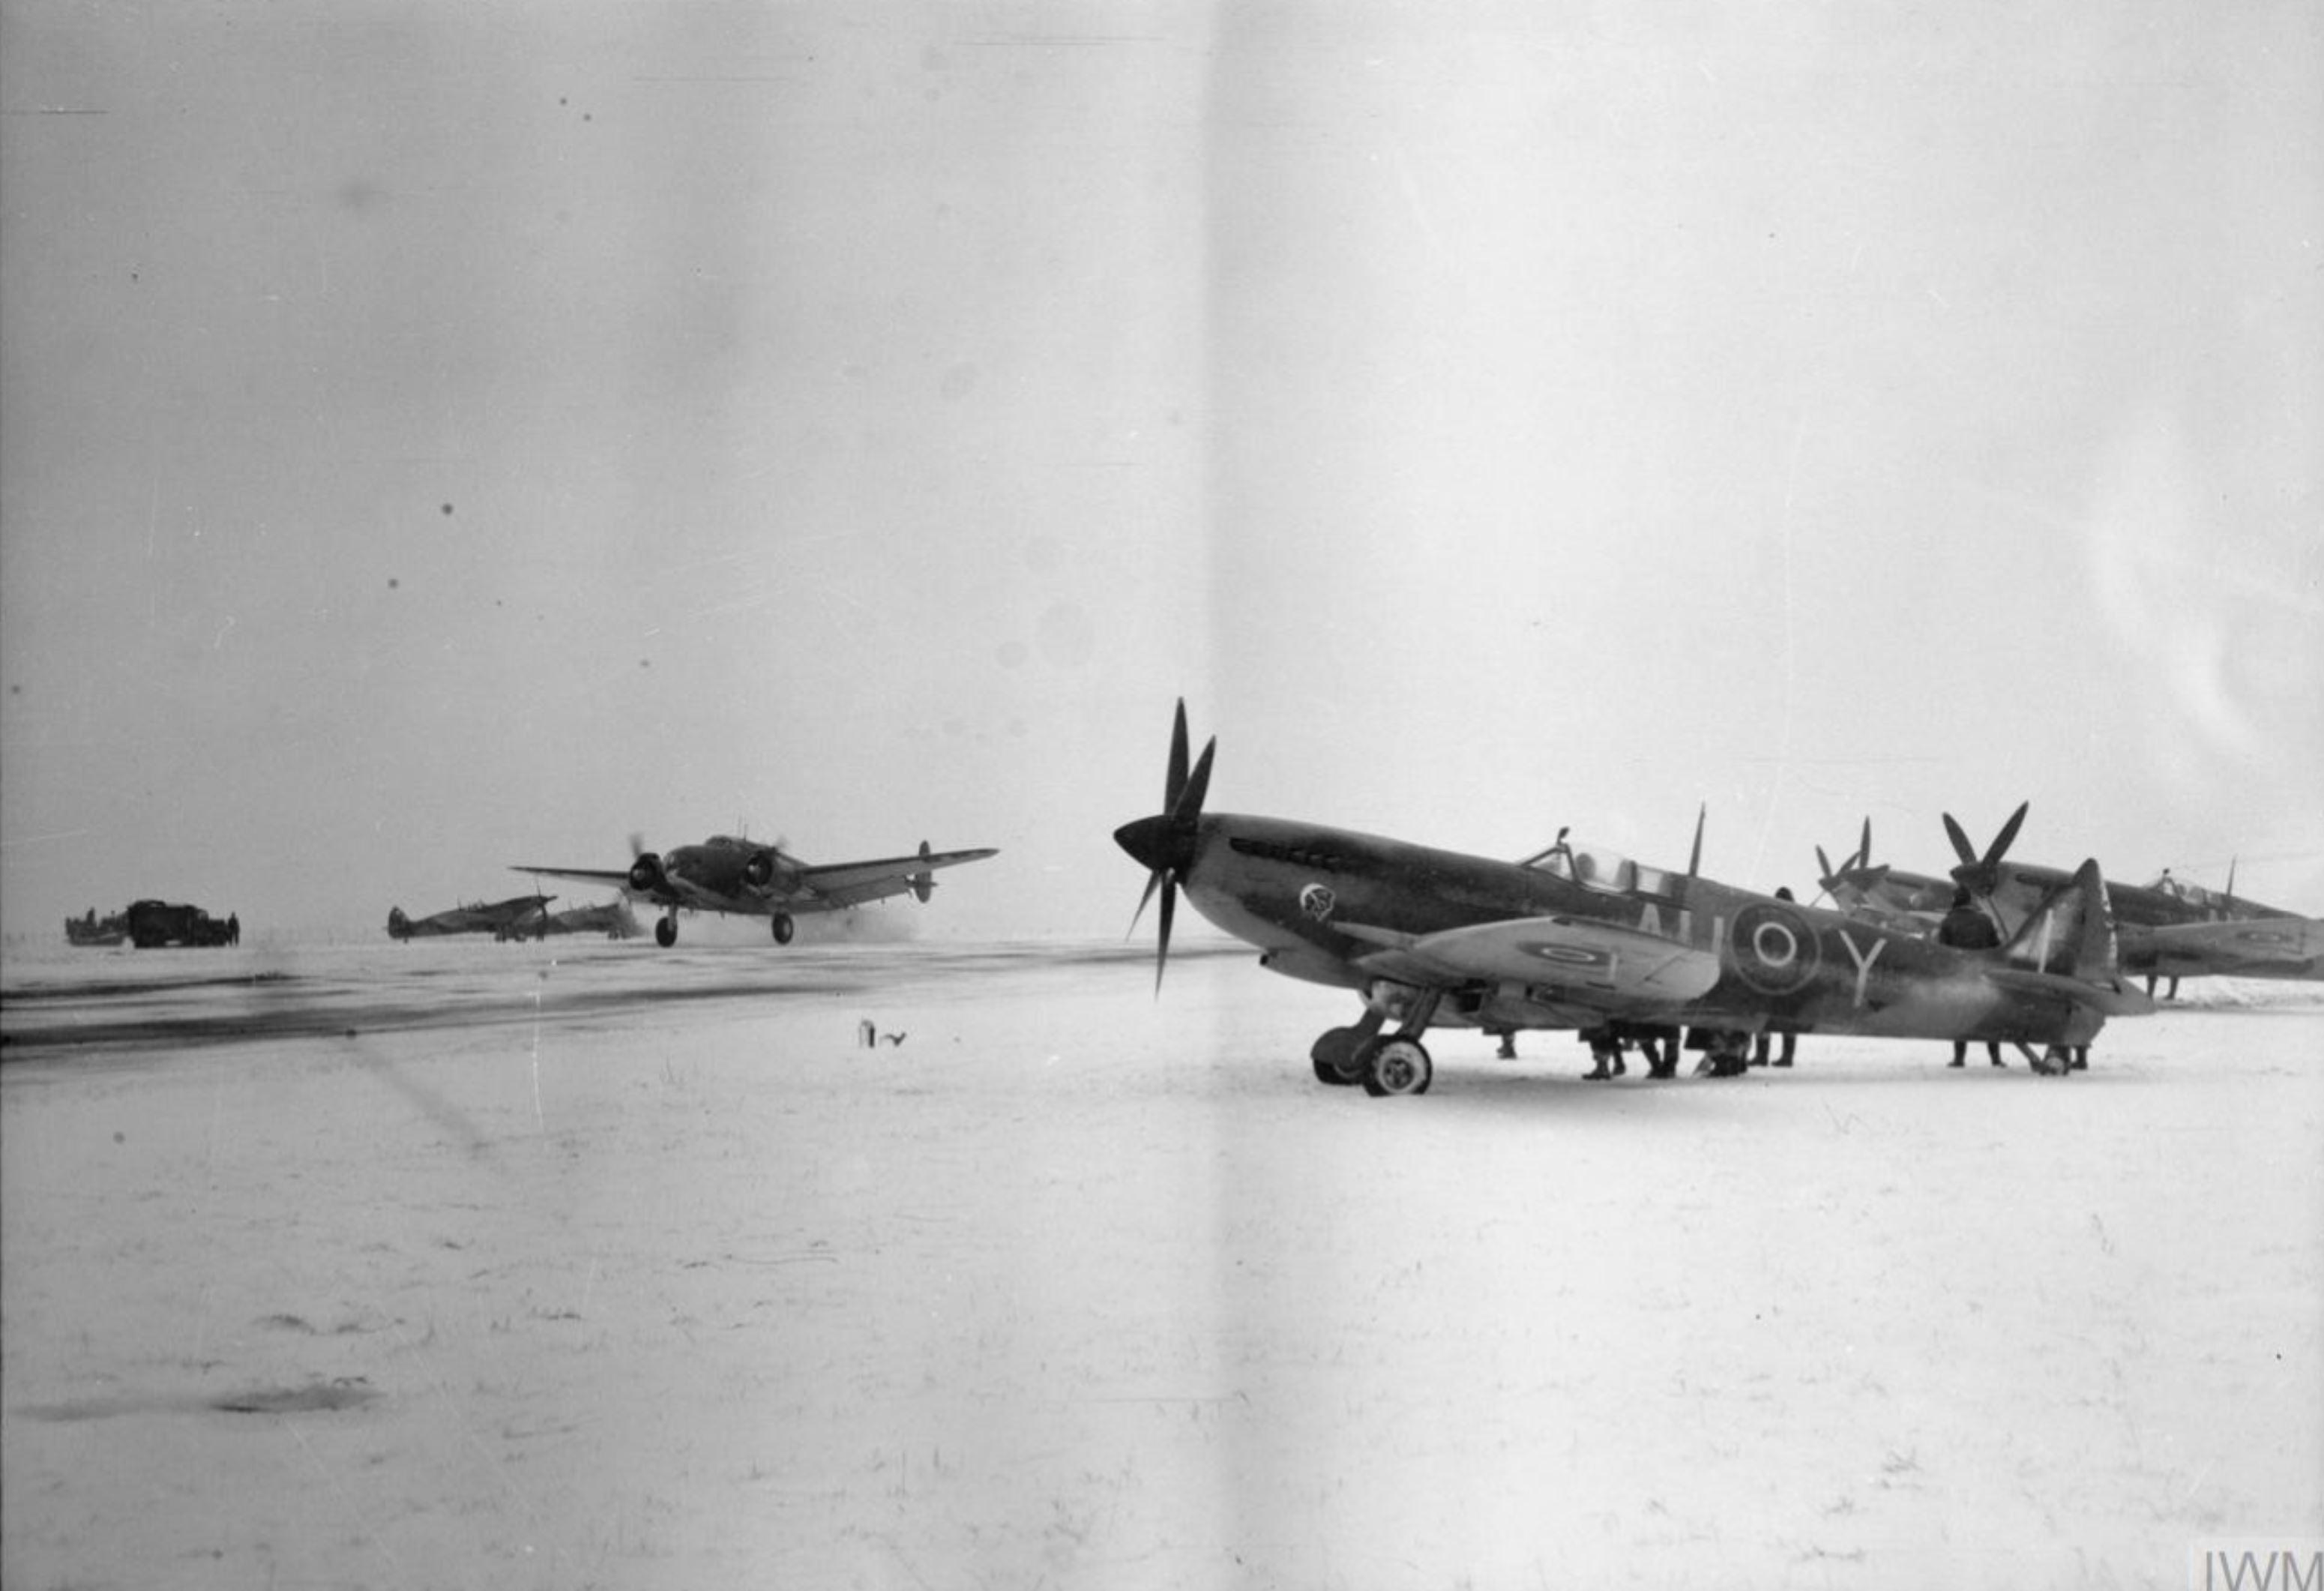 Spitfire LFXVI RCAF 421Sqn AUY at B56 Evere Belgium IWM CL1779